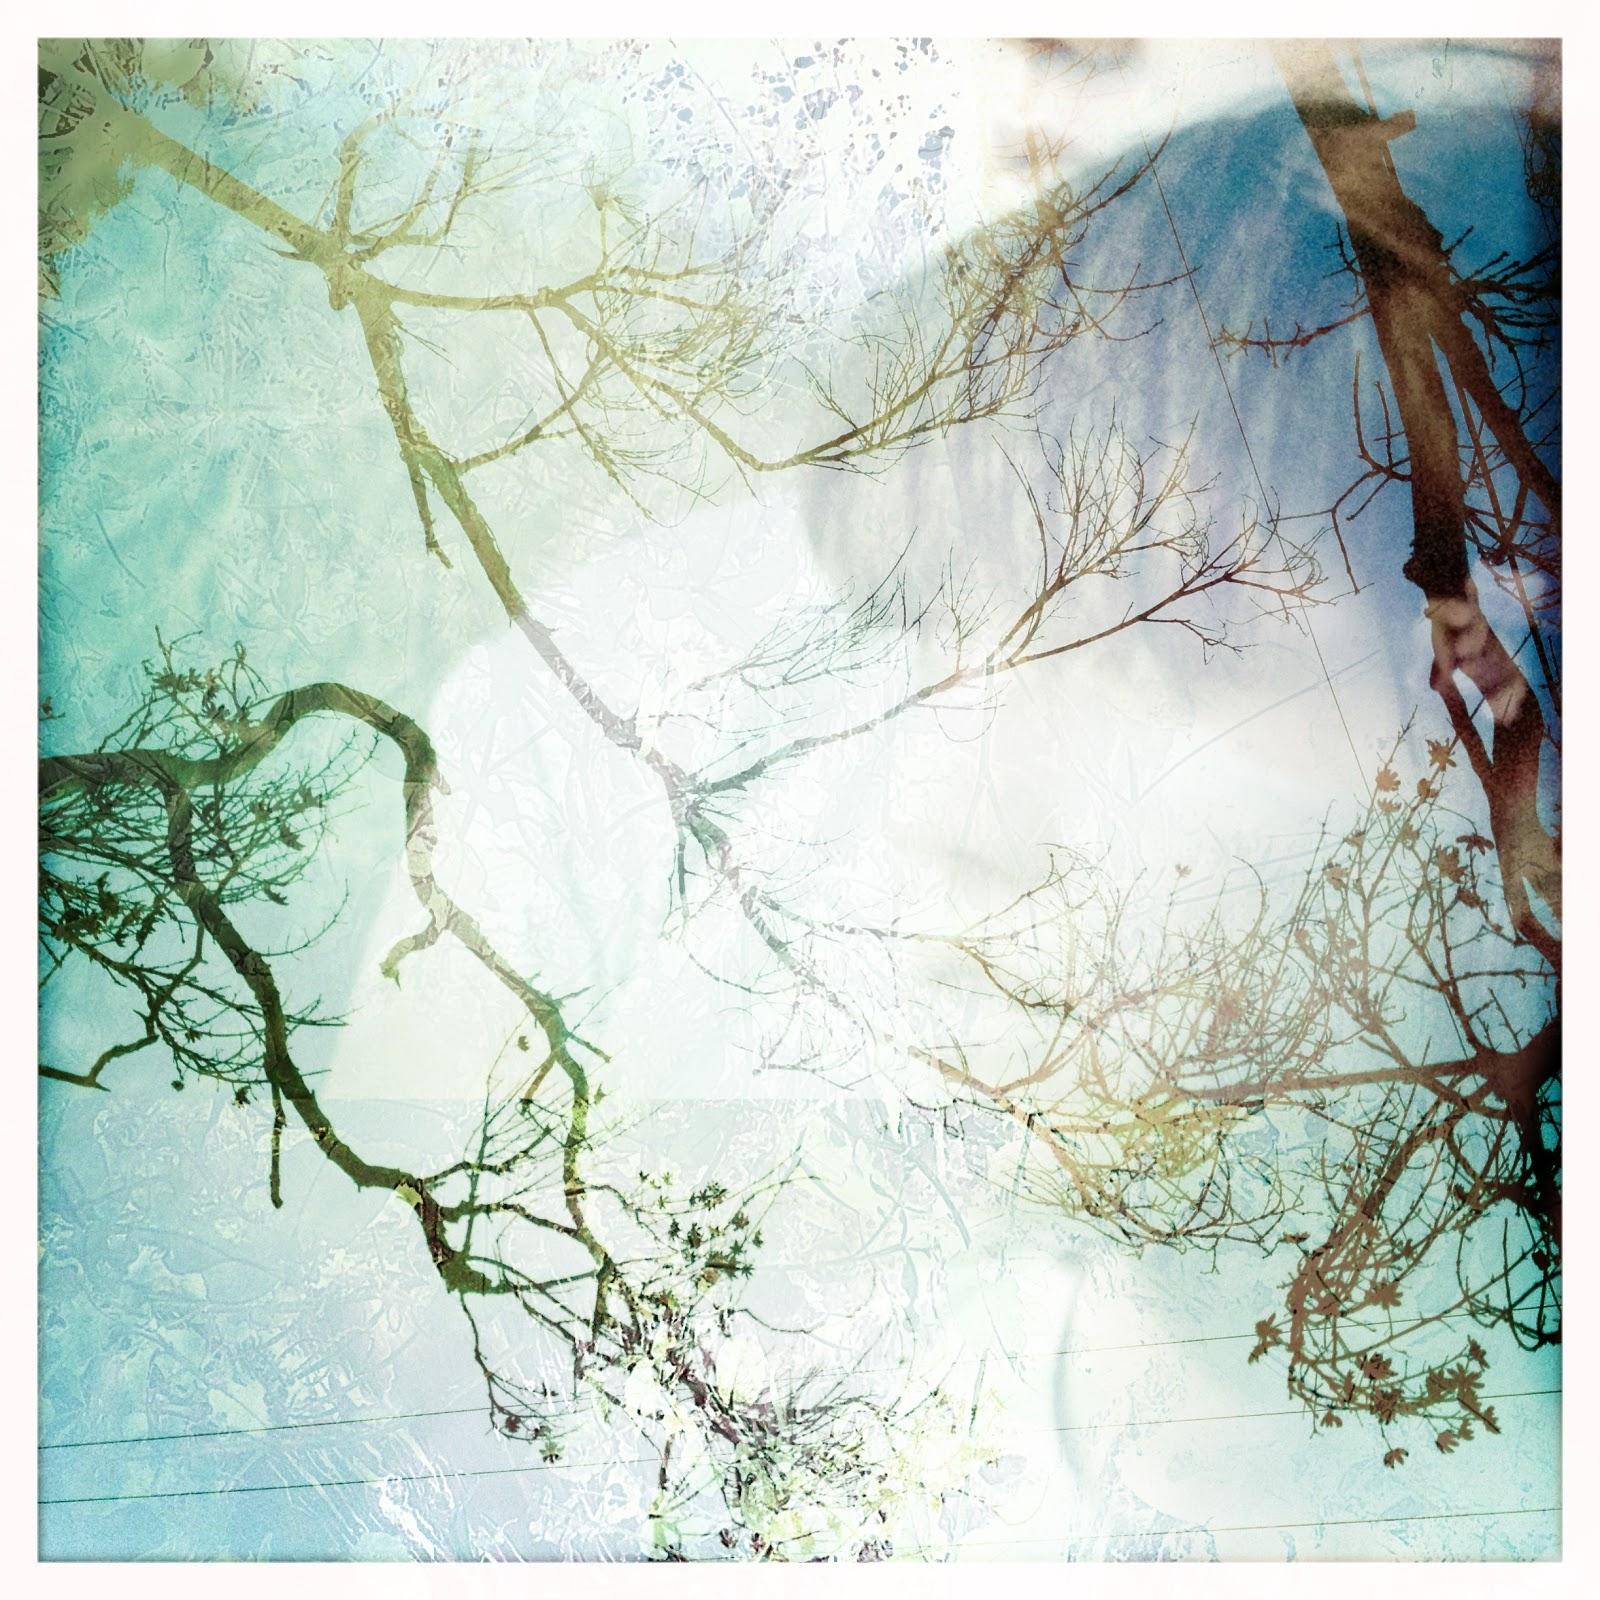 Karina Allrich : Remix ©2014 All rights reserved.